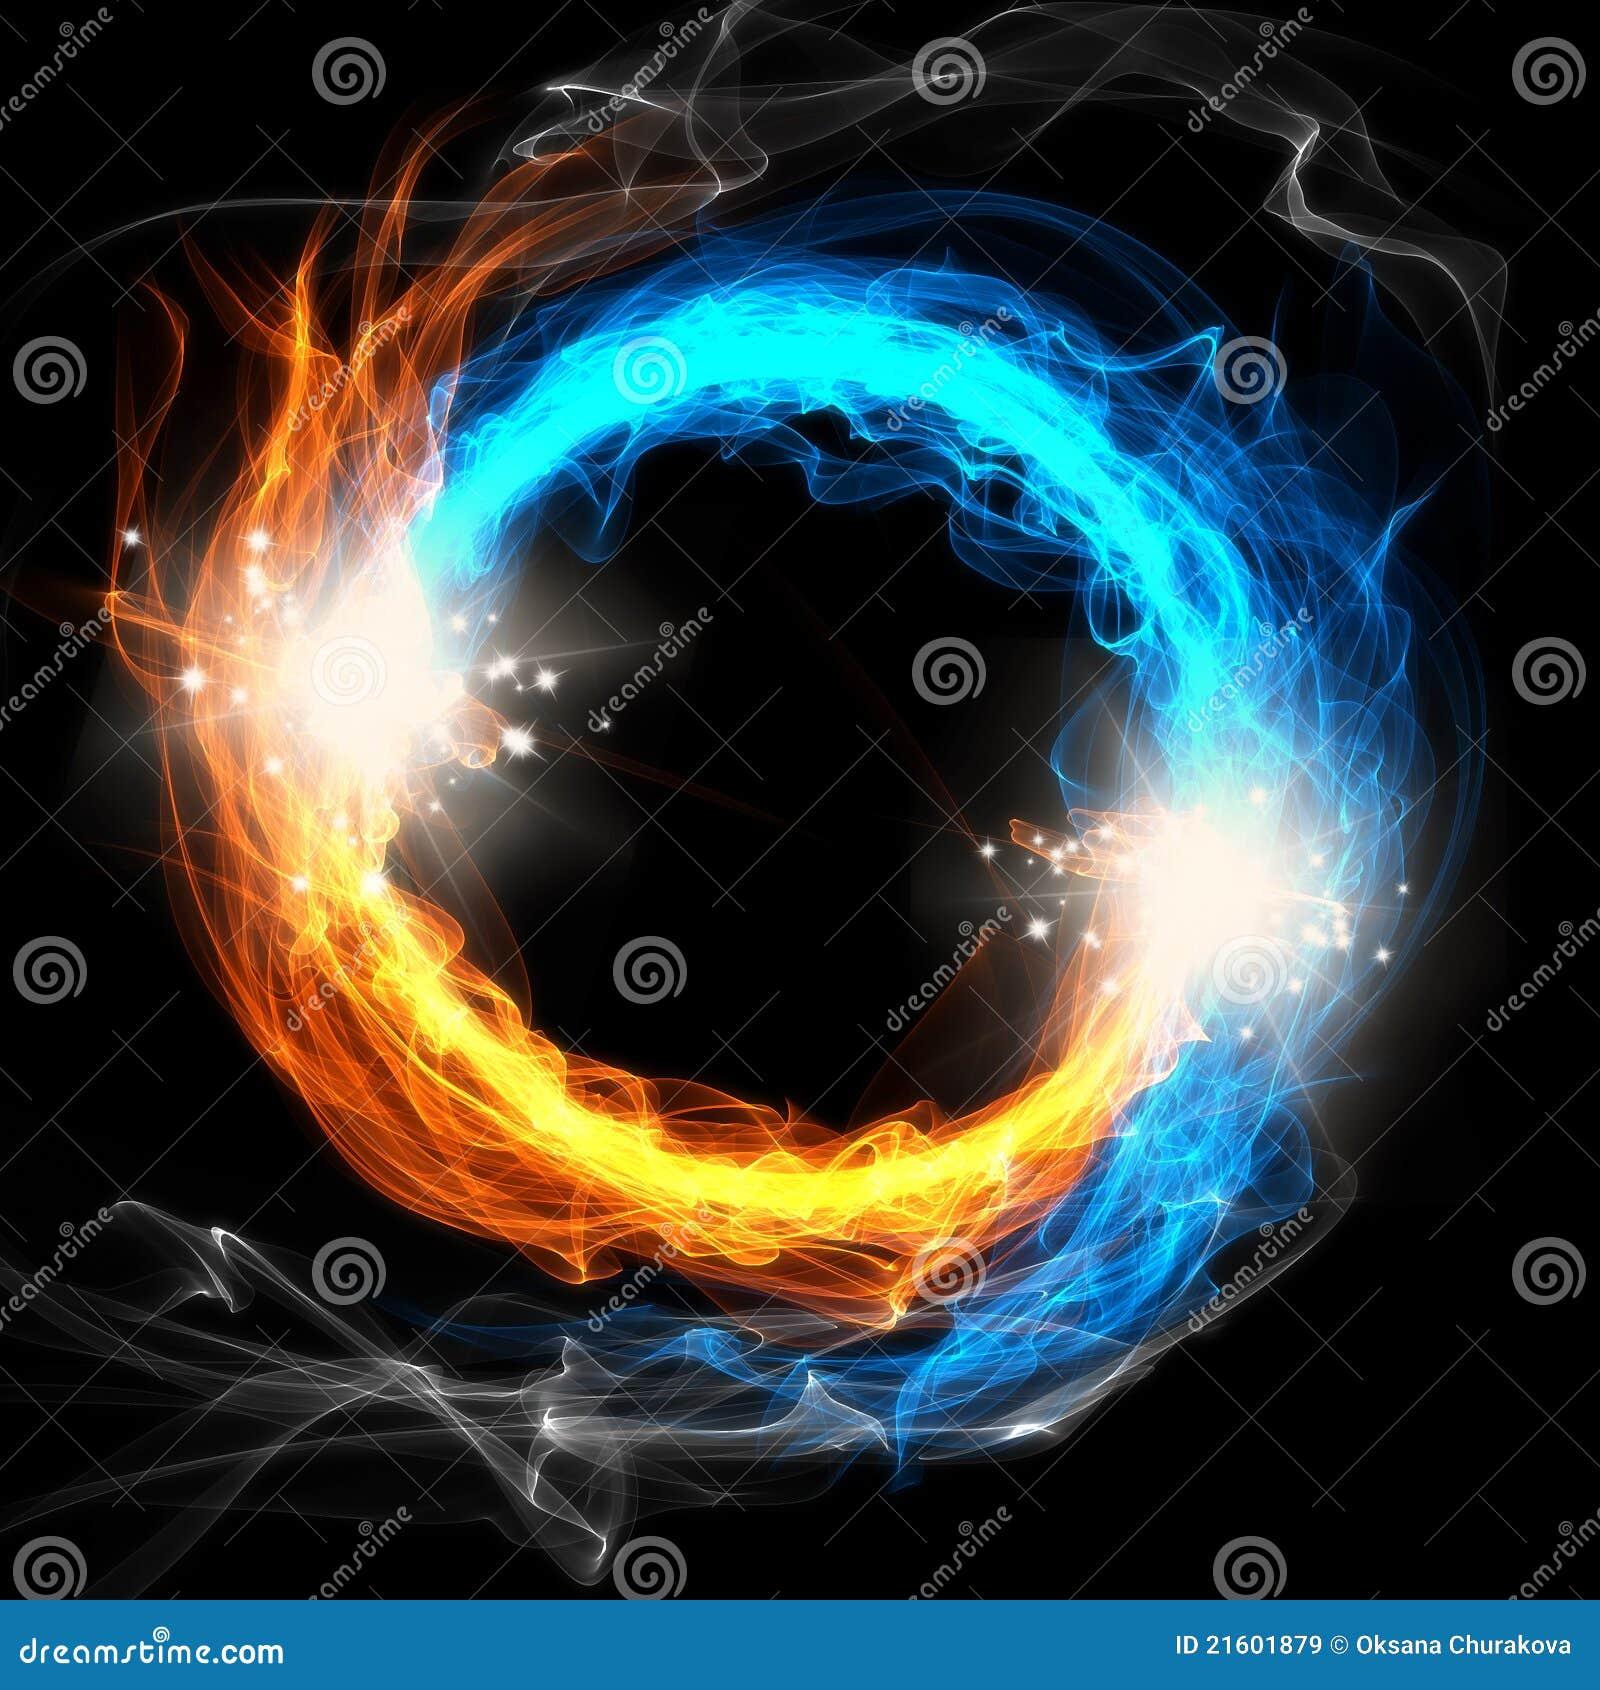 Smoke Free Fire Ring